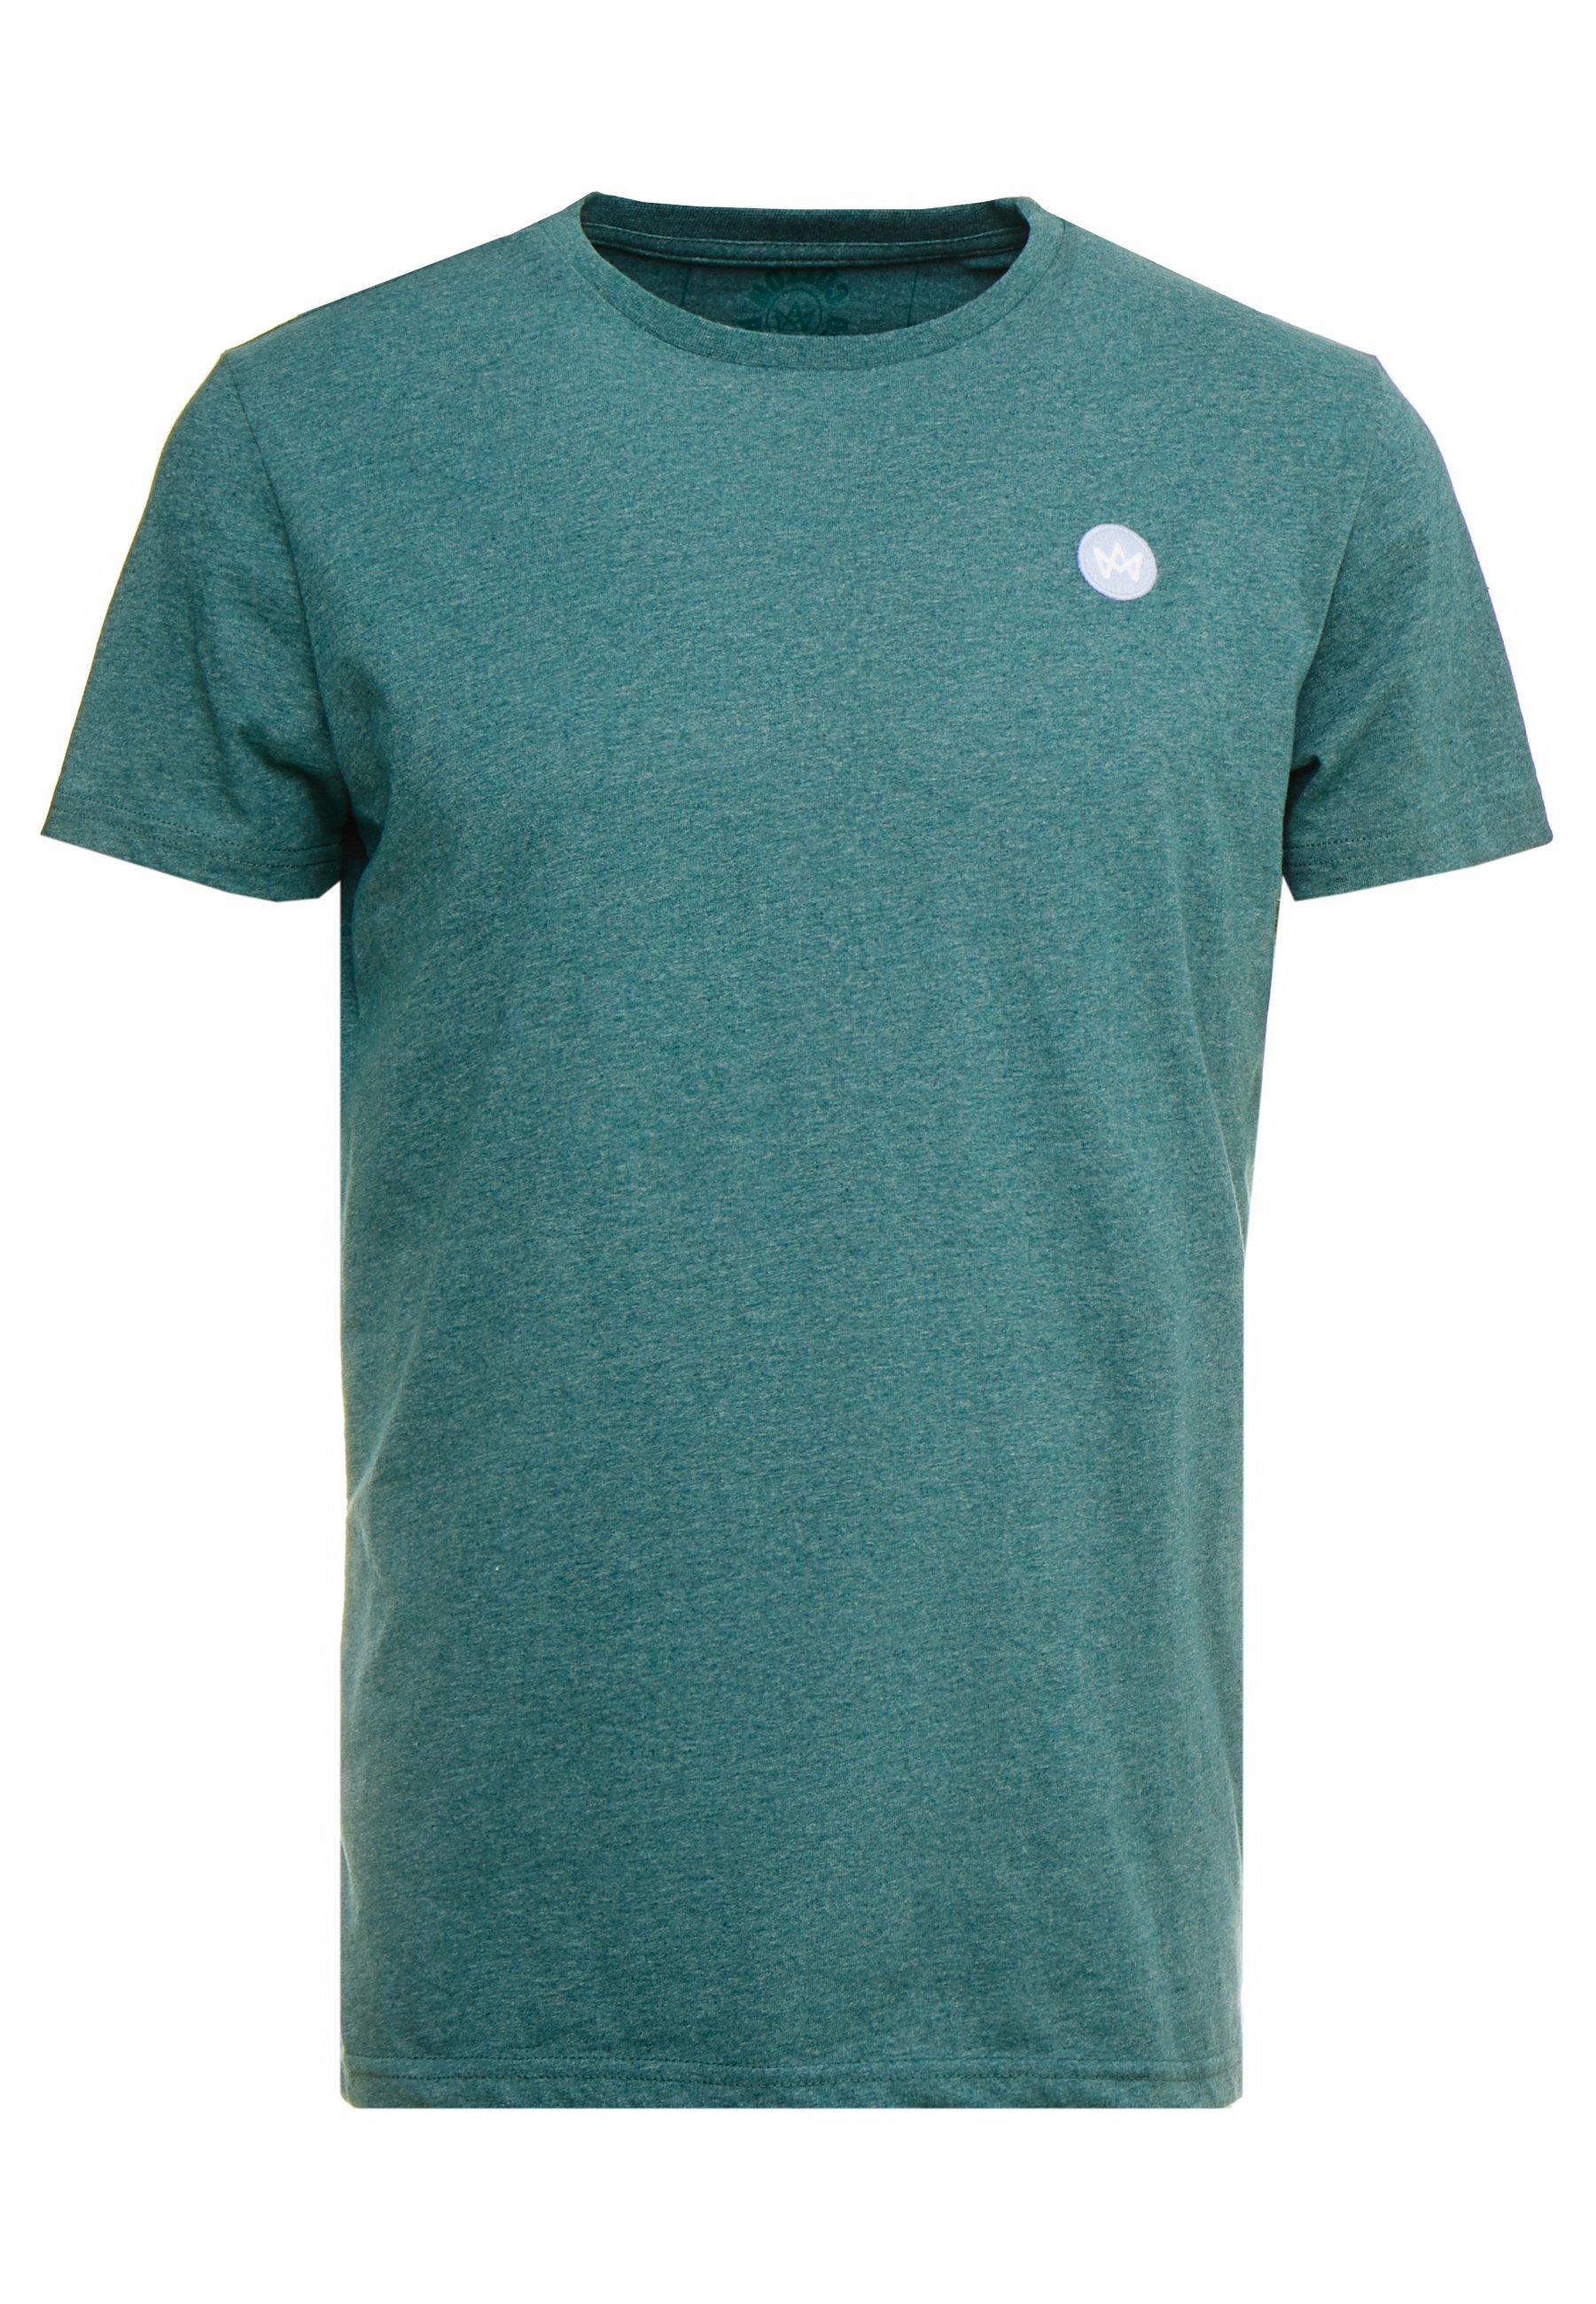 Kronstadt Timmi Tee - T-shirt Basic White daRcx